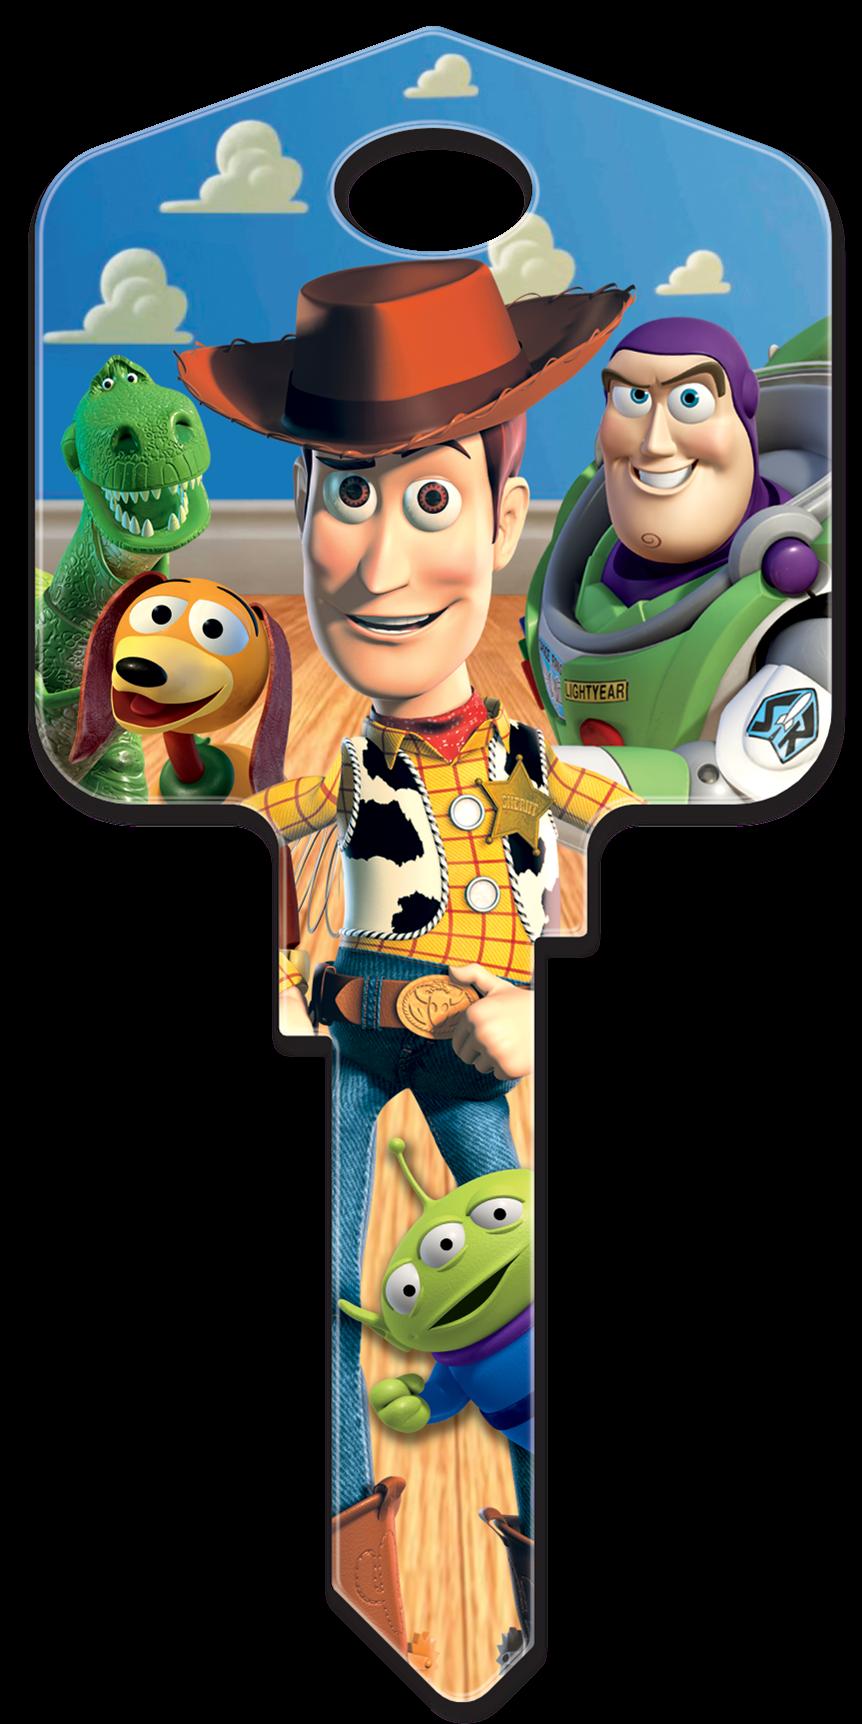 Disney Pixar 'Toy Story' Buzz & Woody large headed licensed painted house key blank